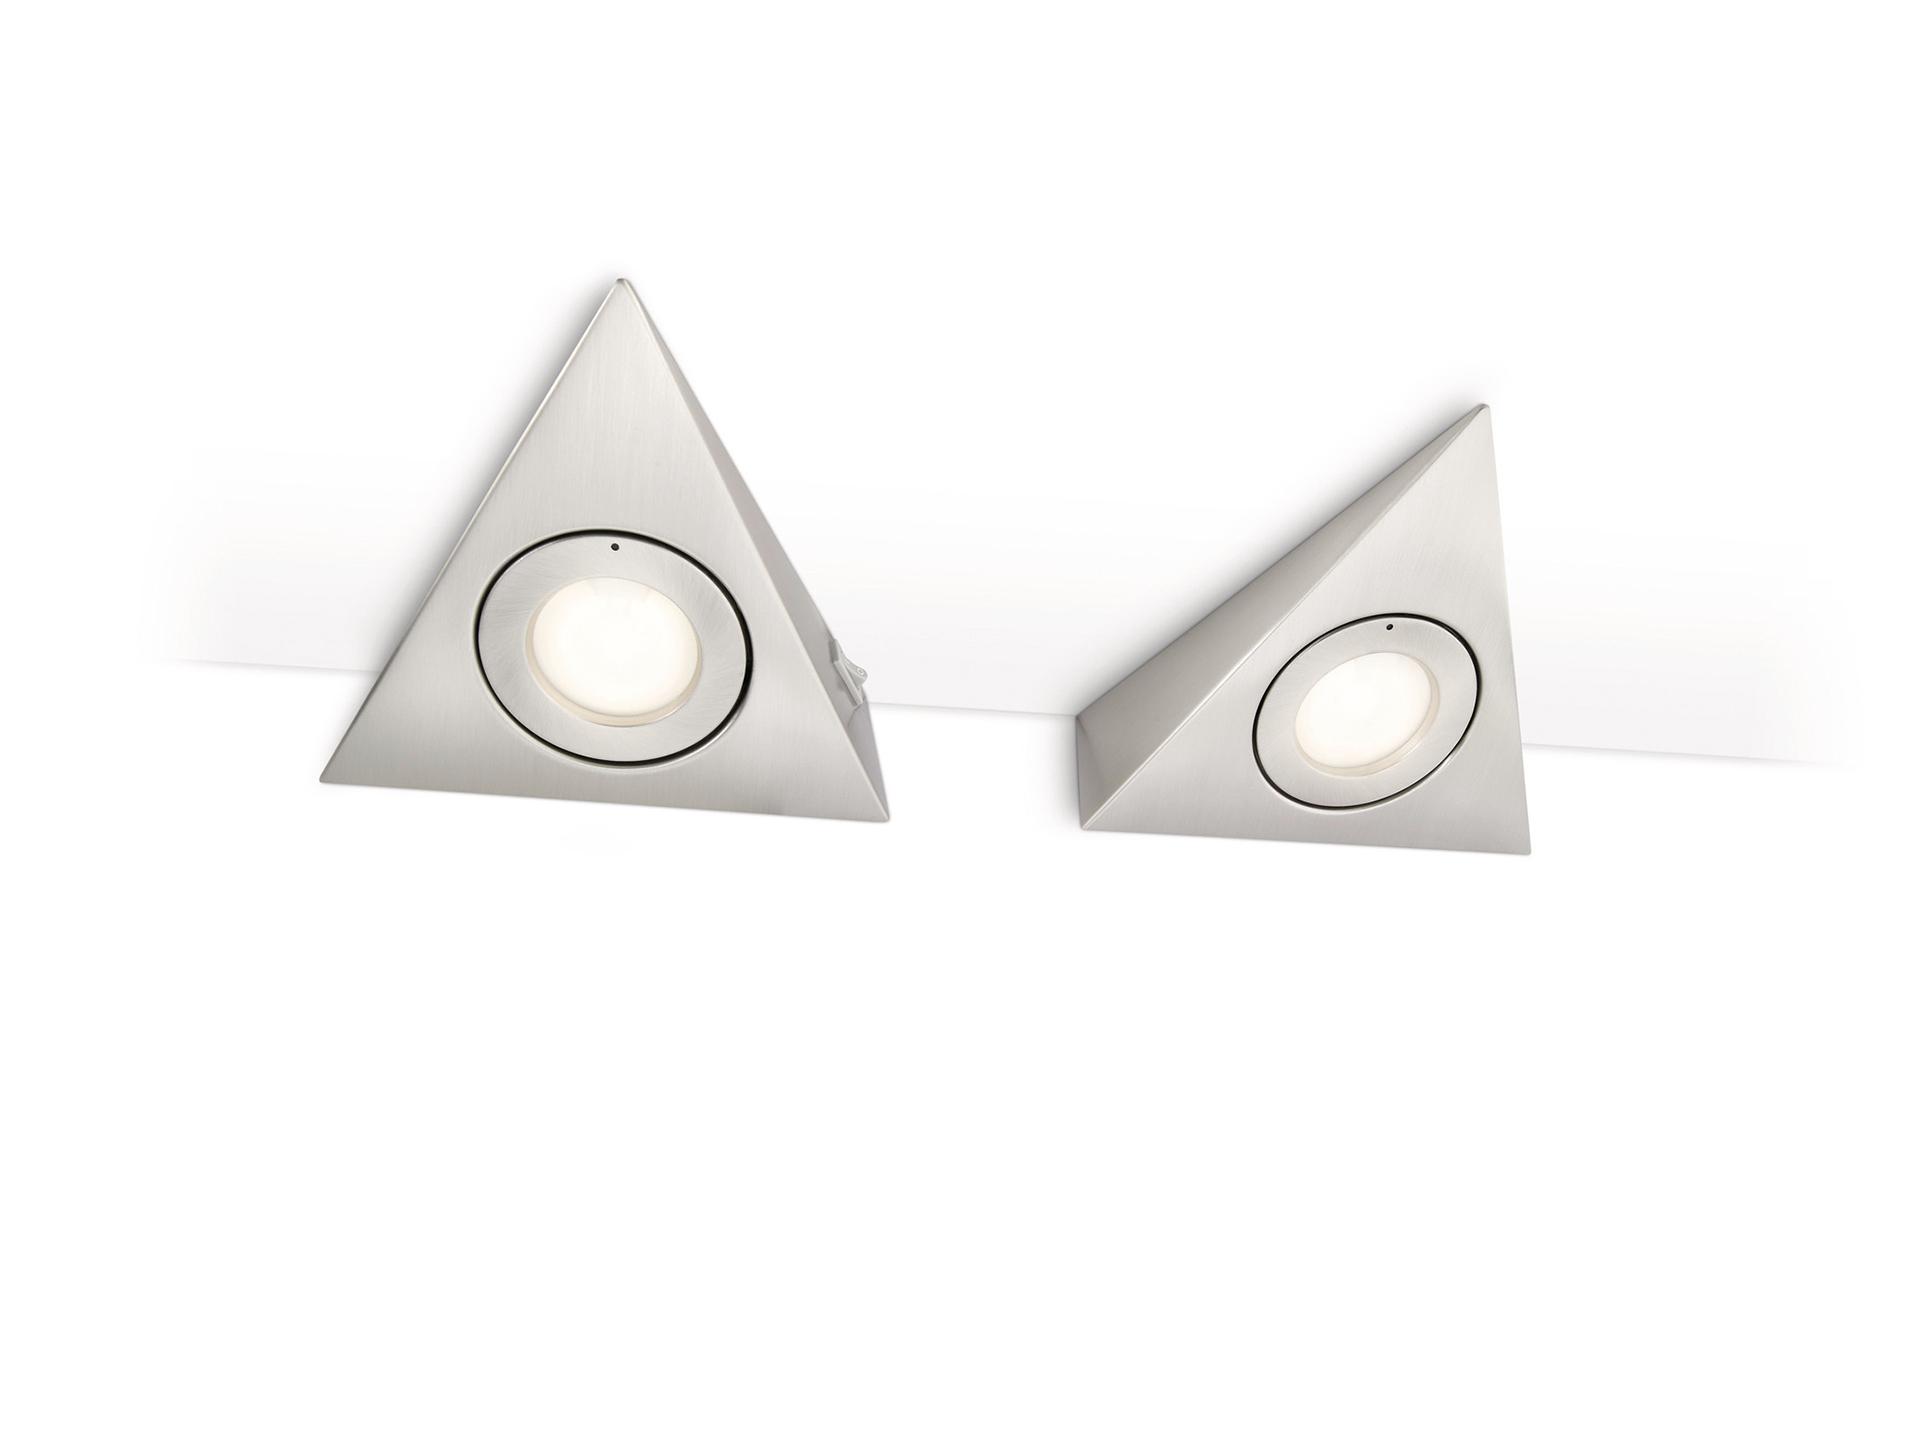 philips etoile keukenkast verlichting g4 2x20w 255lm mat chroom hubo